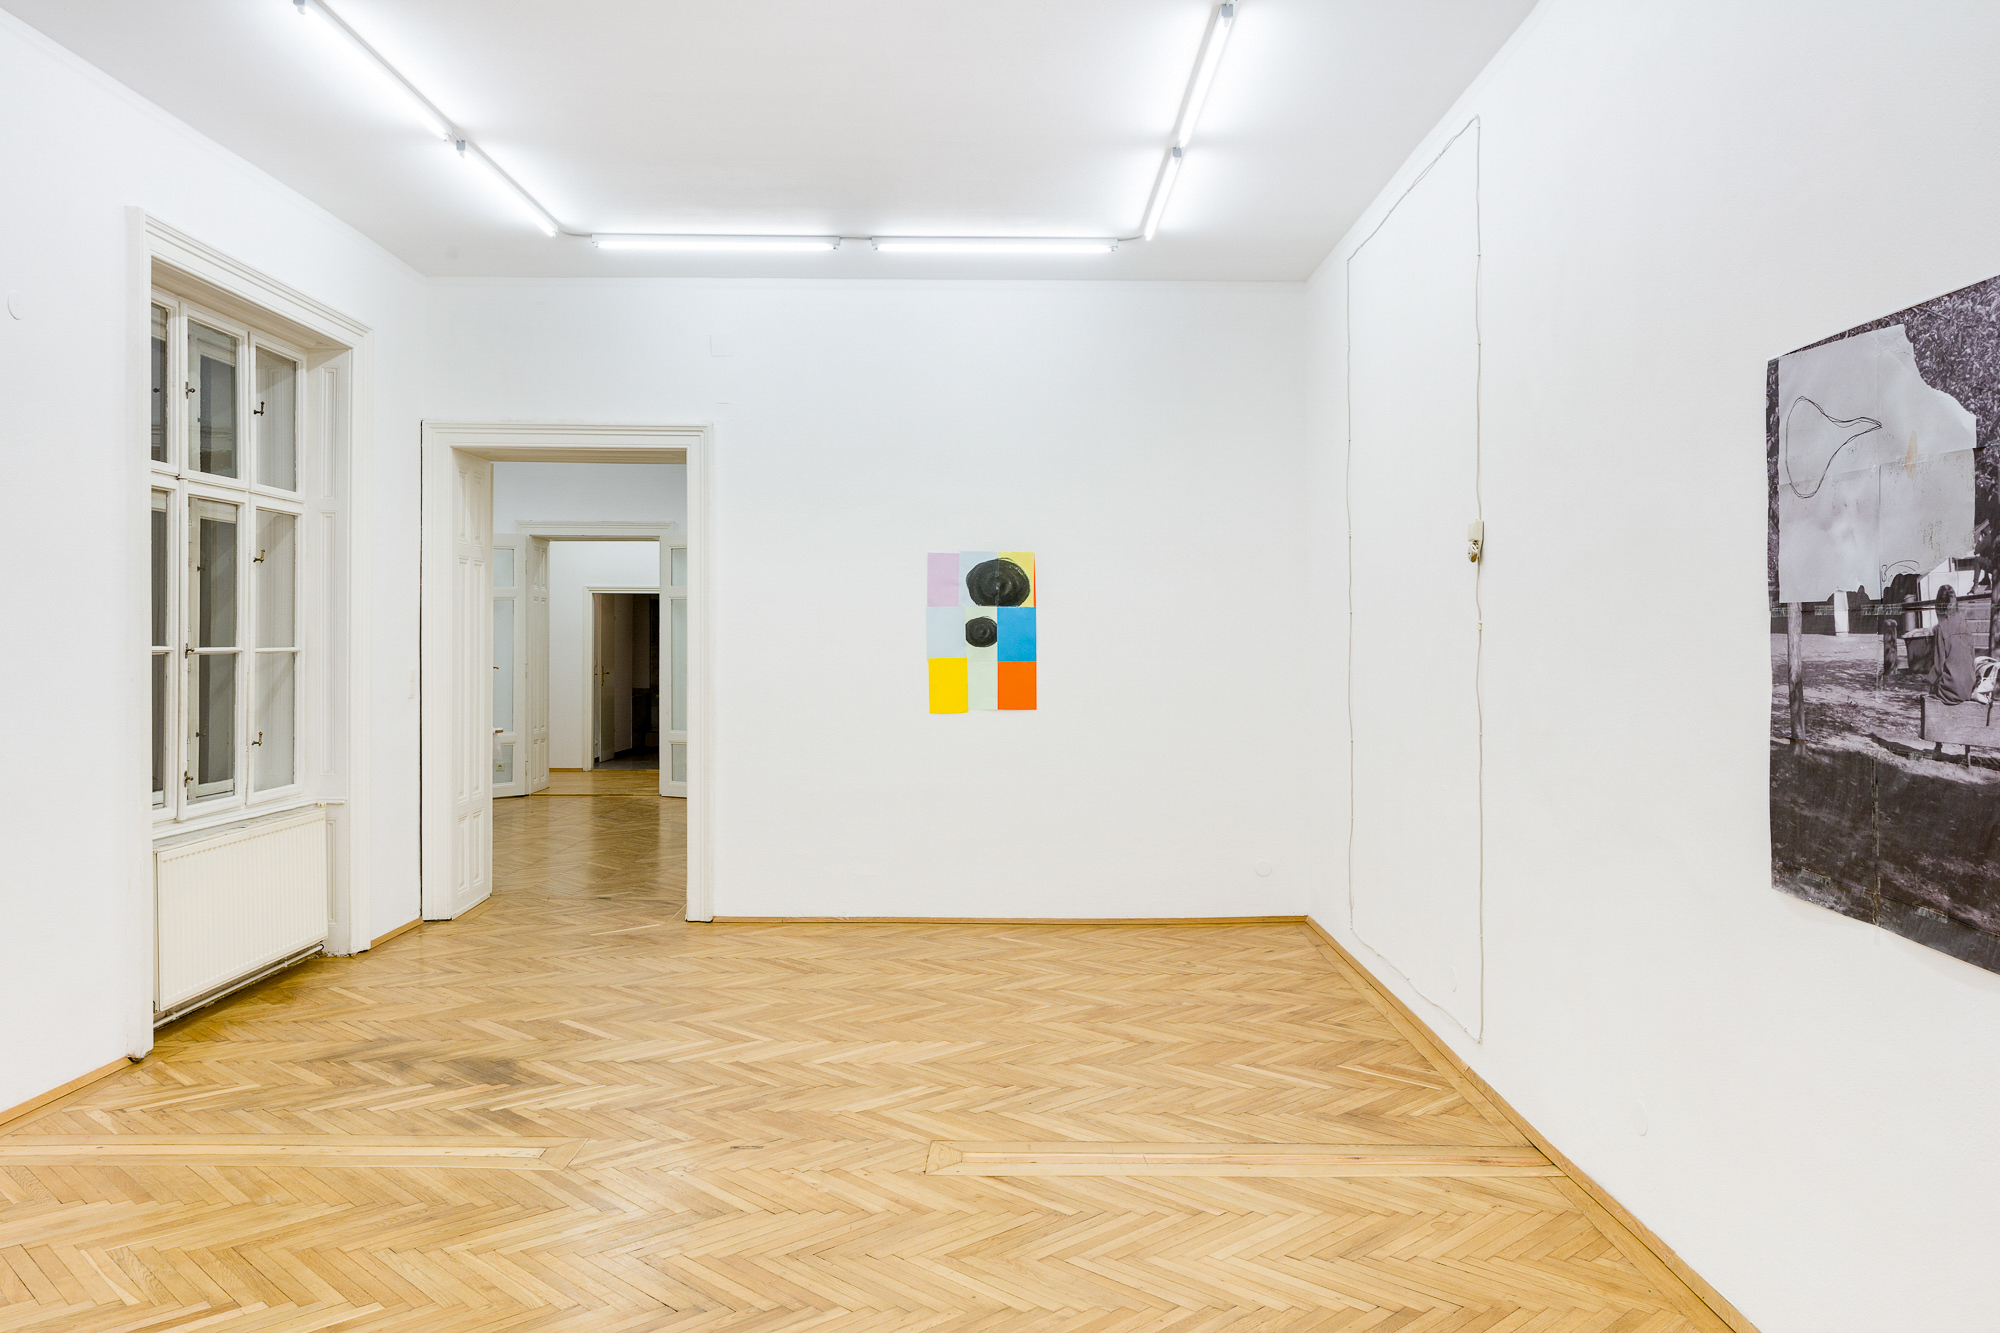 2018_11_08_Vera Lutz at Felix Gaudlitz_by kunst-dokumentation.com_023_web.jpg